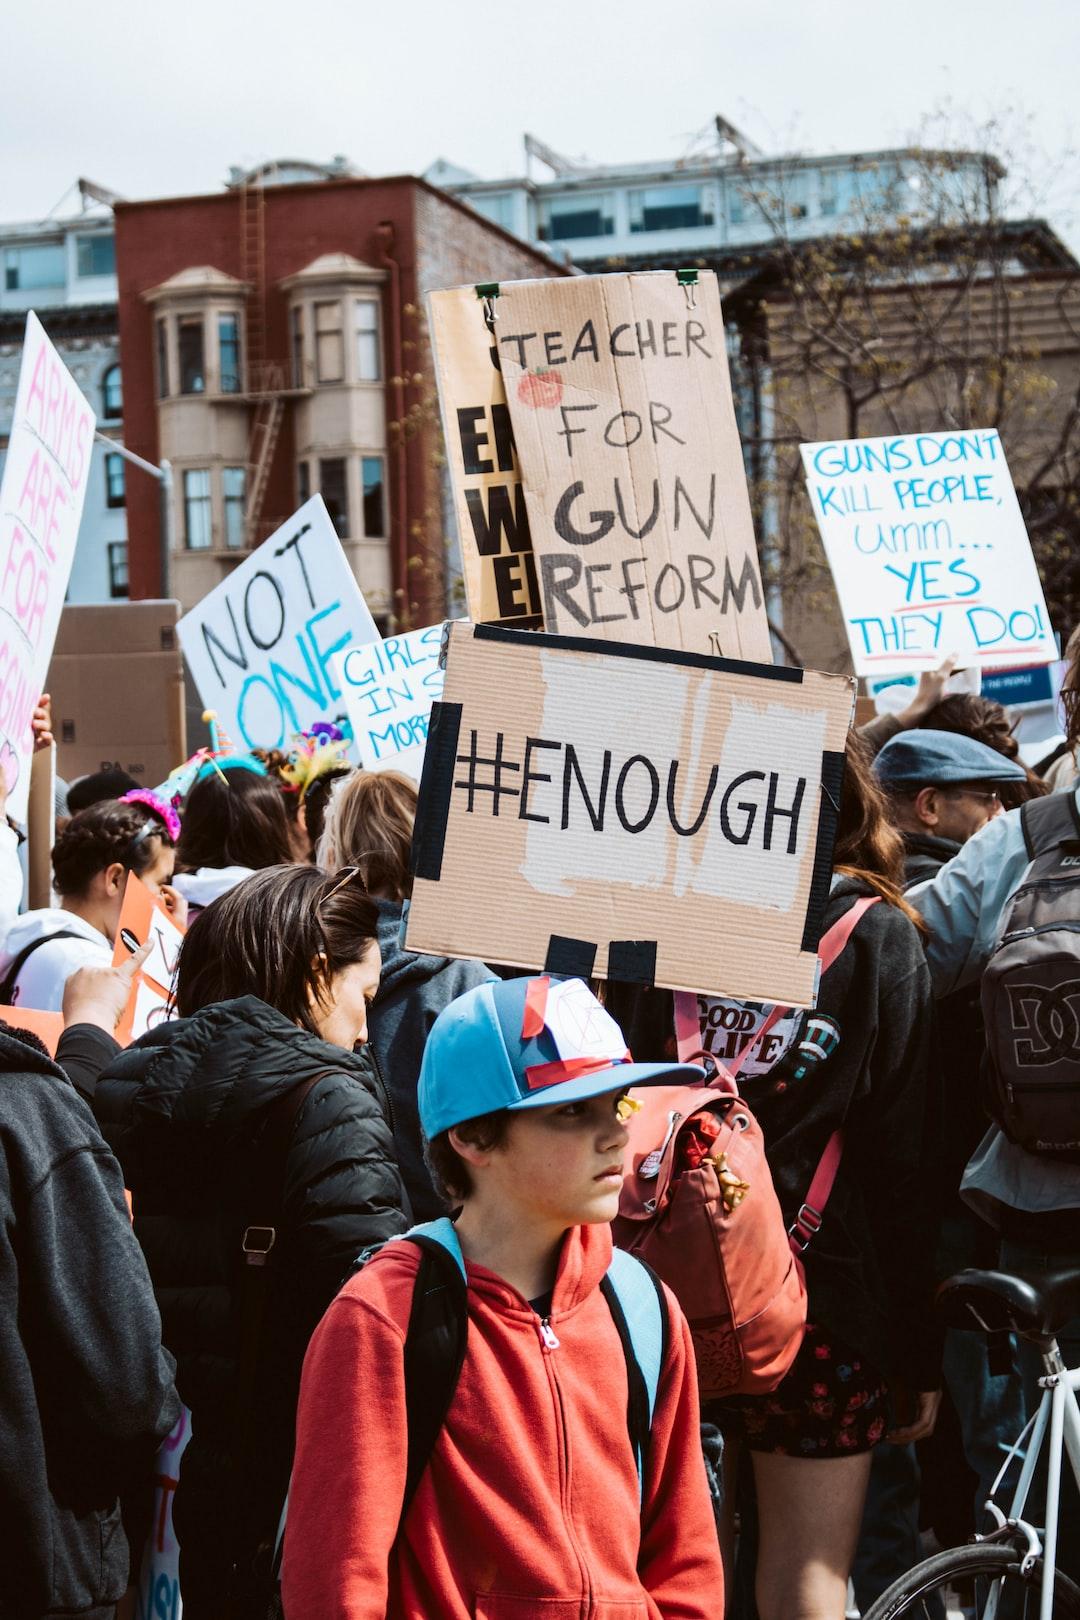 Lack of Common Sense Gun Control Laws